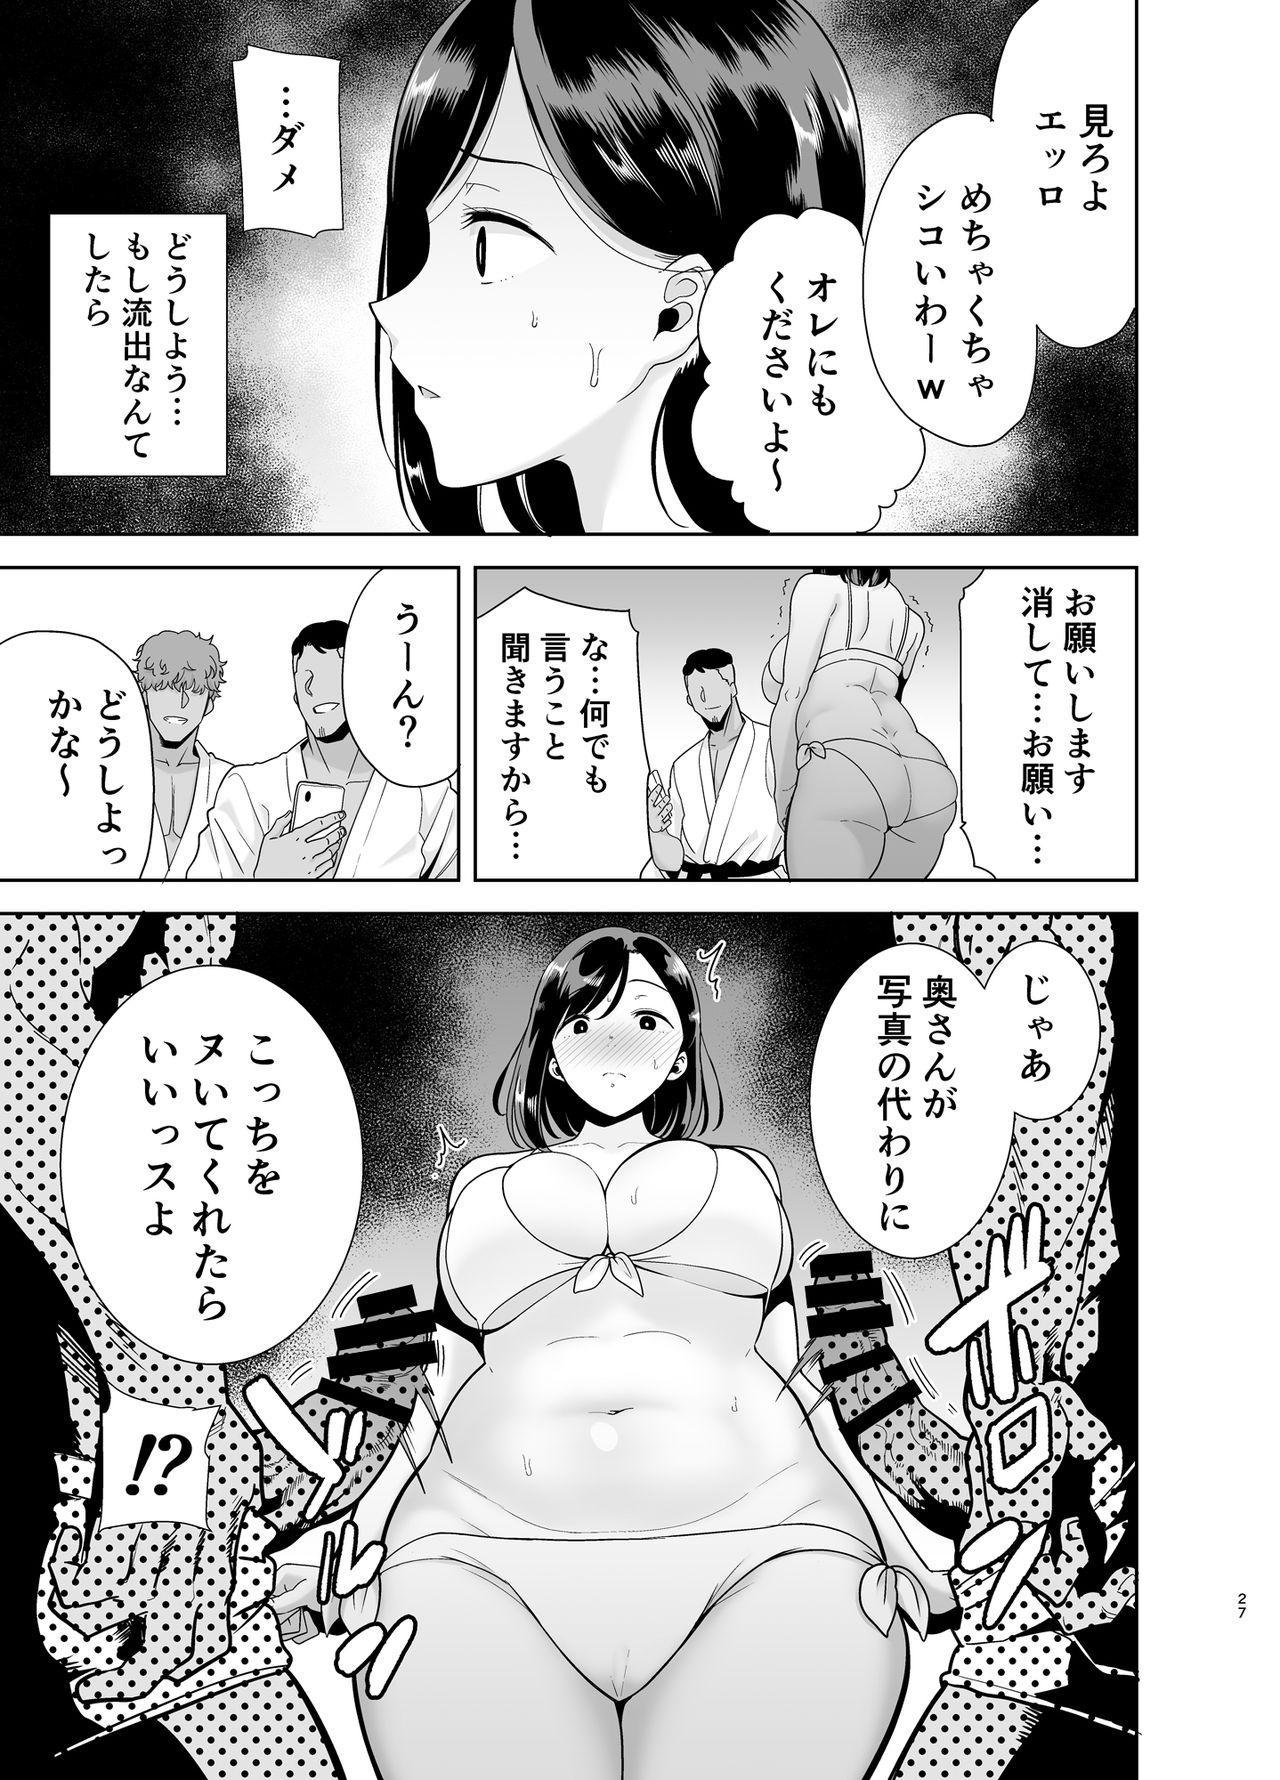 Natsuzuma 125